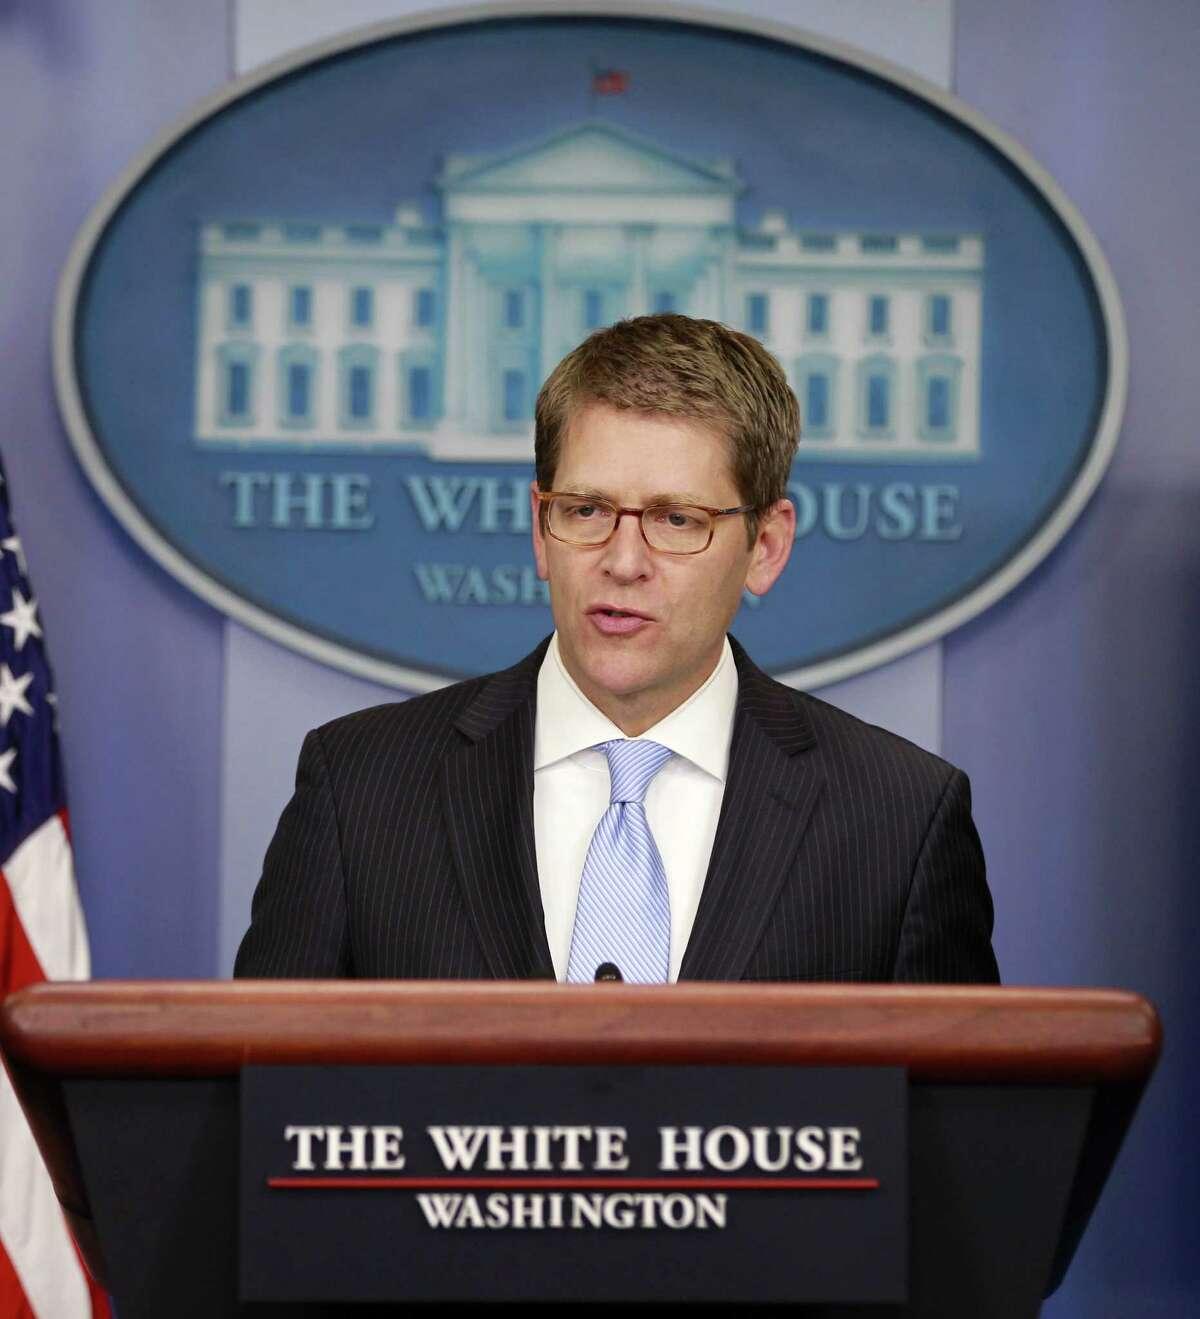 White House Press Secretary Jay Carney backs up the president's denials.